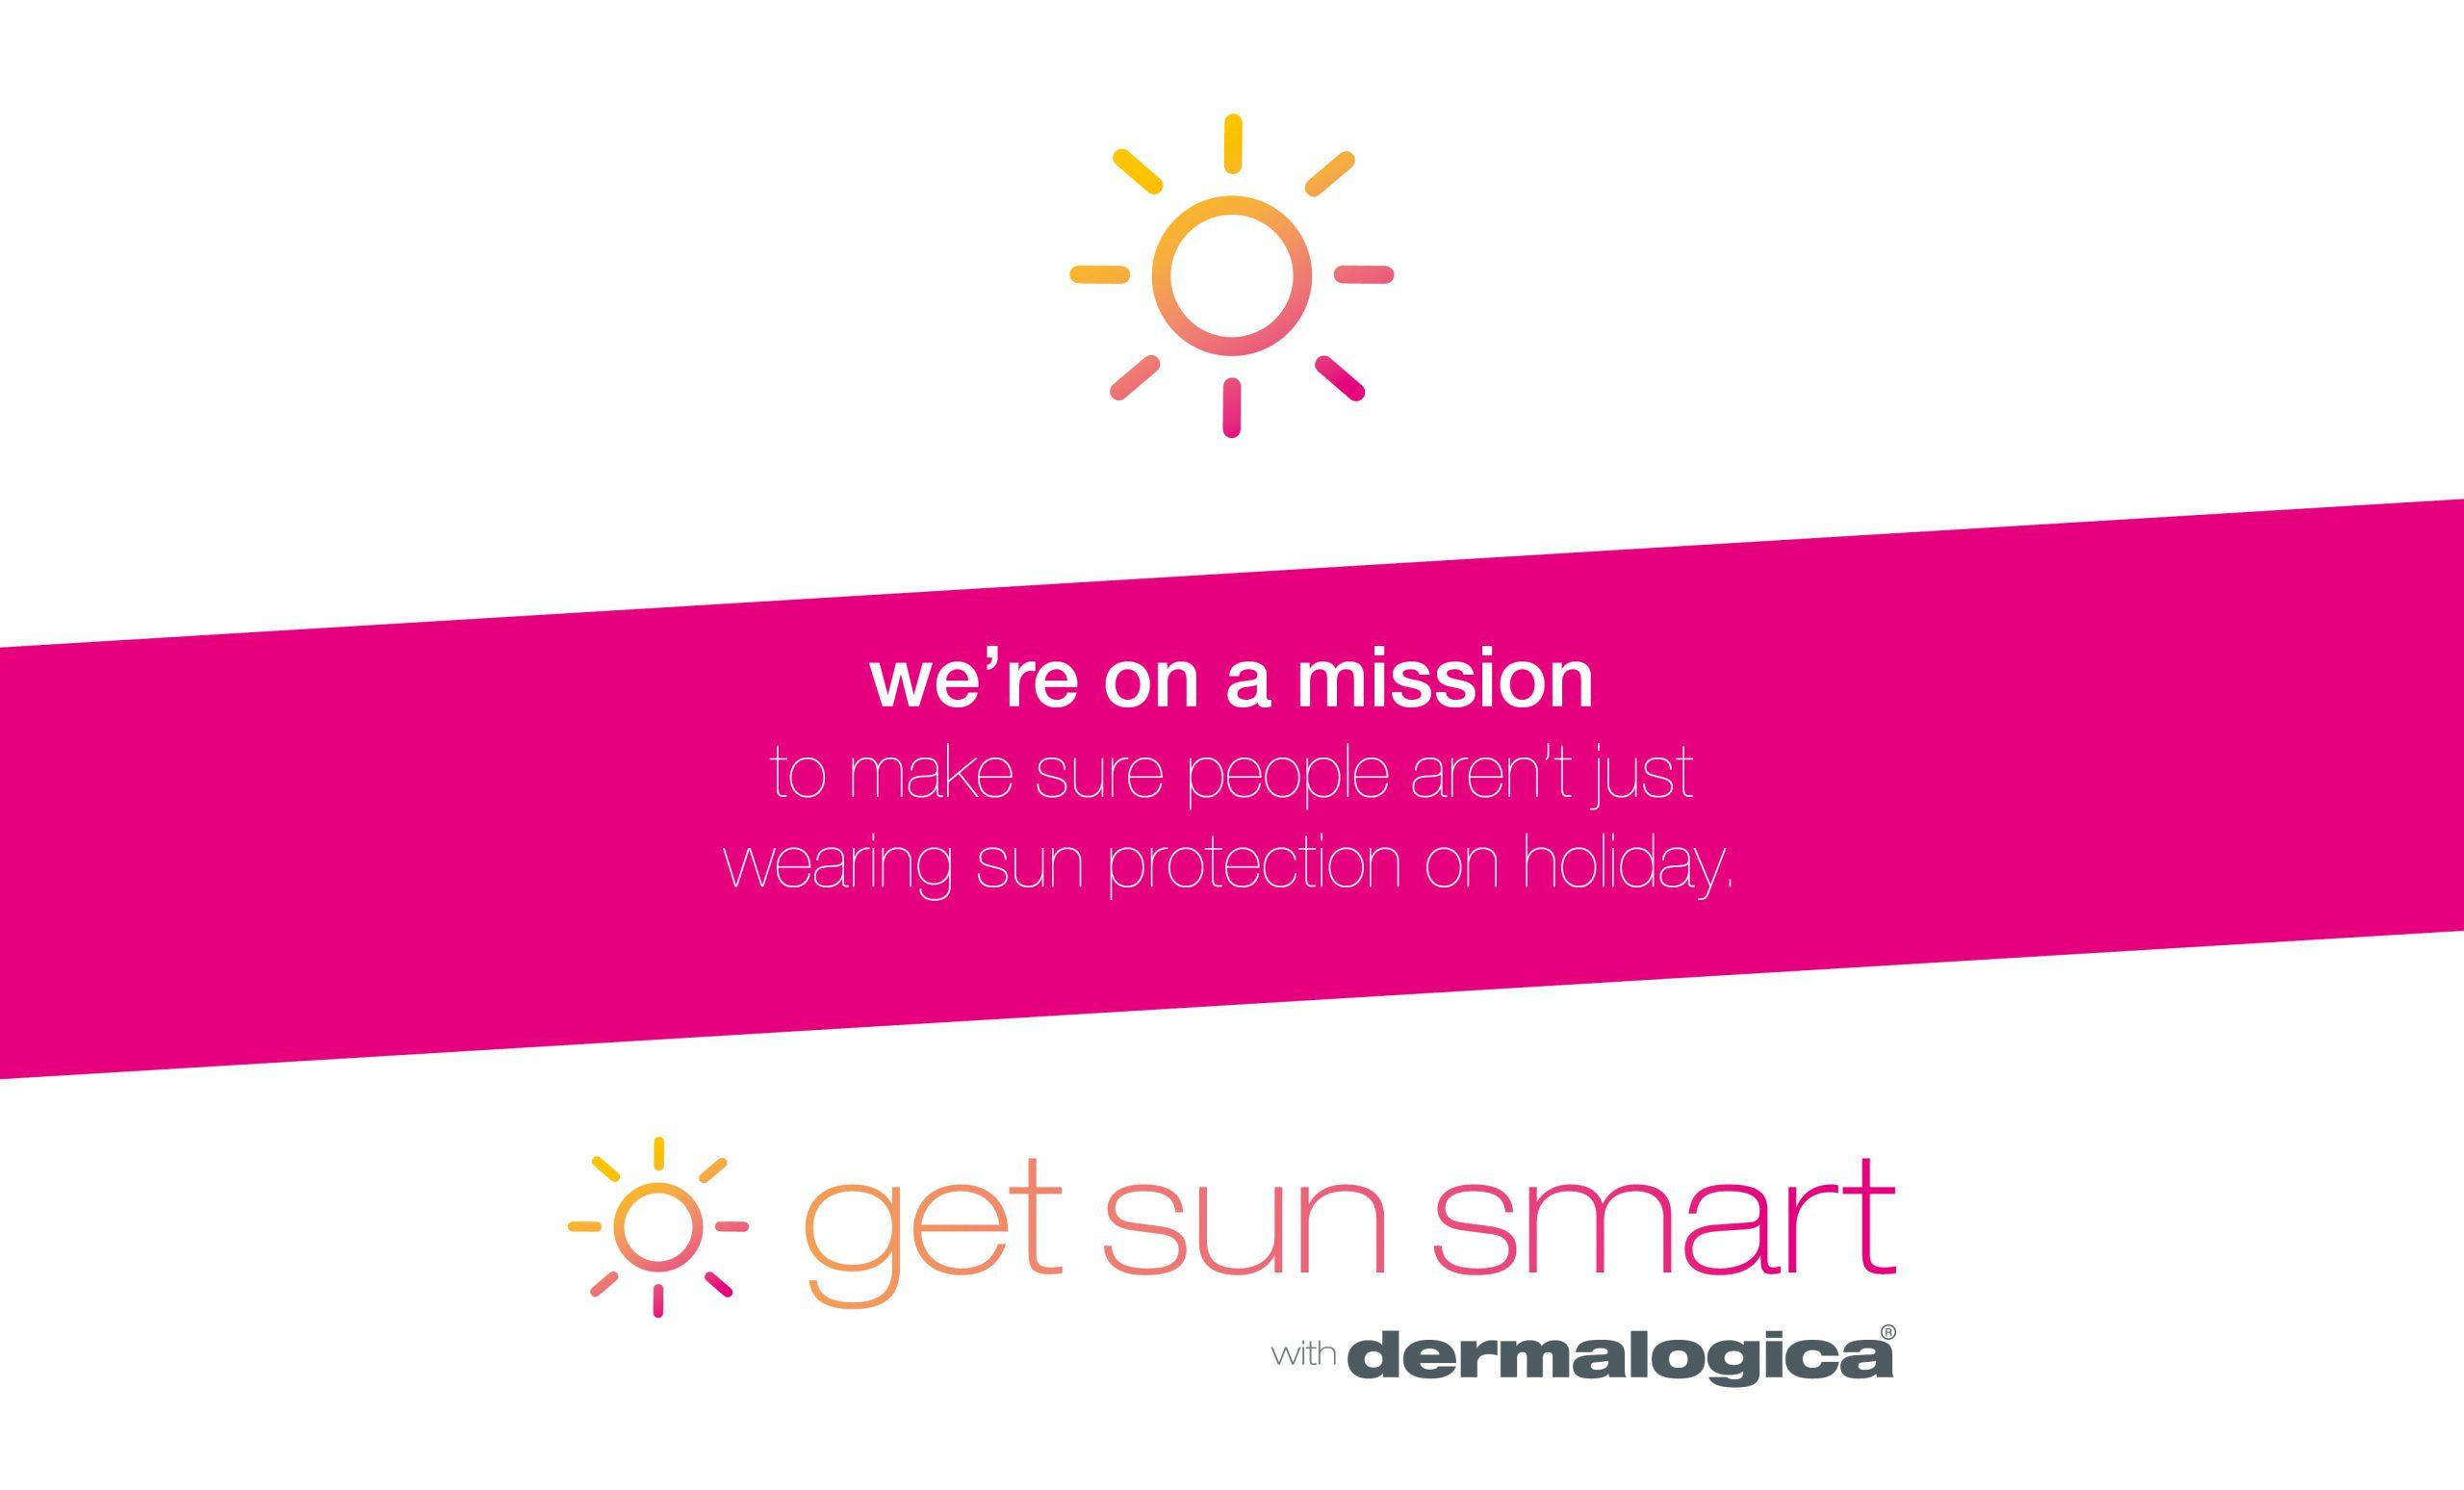 Get Sun Smart @The Skin Company